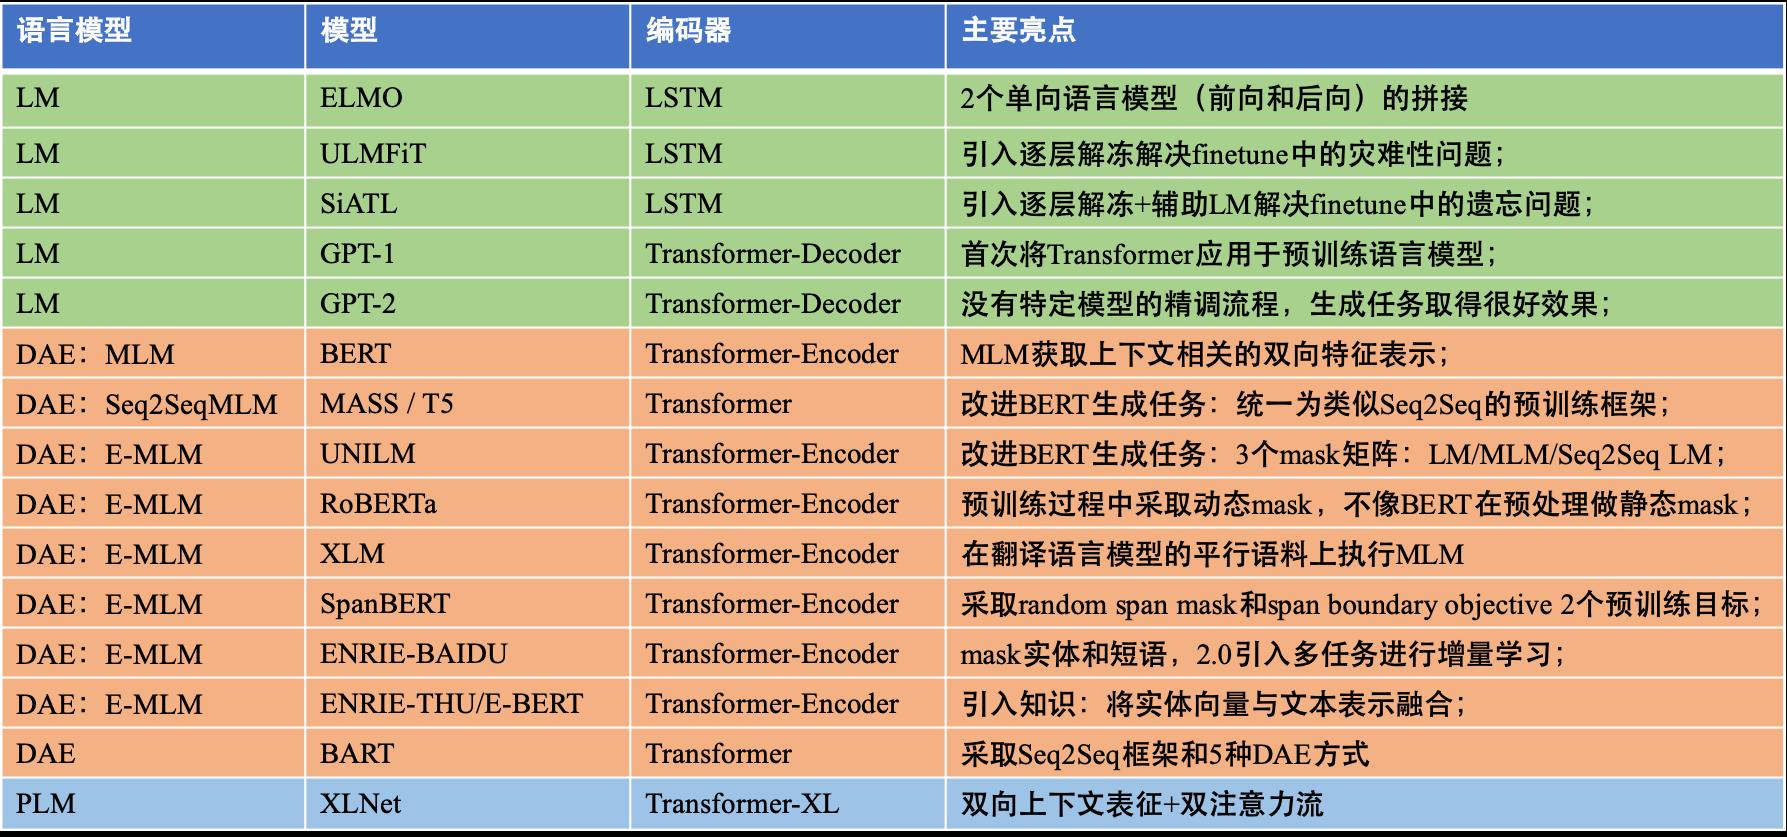 基于上下文 ContextBased 的 3 种语言模型 PTMs 总结.png